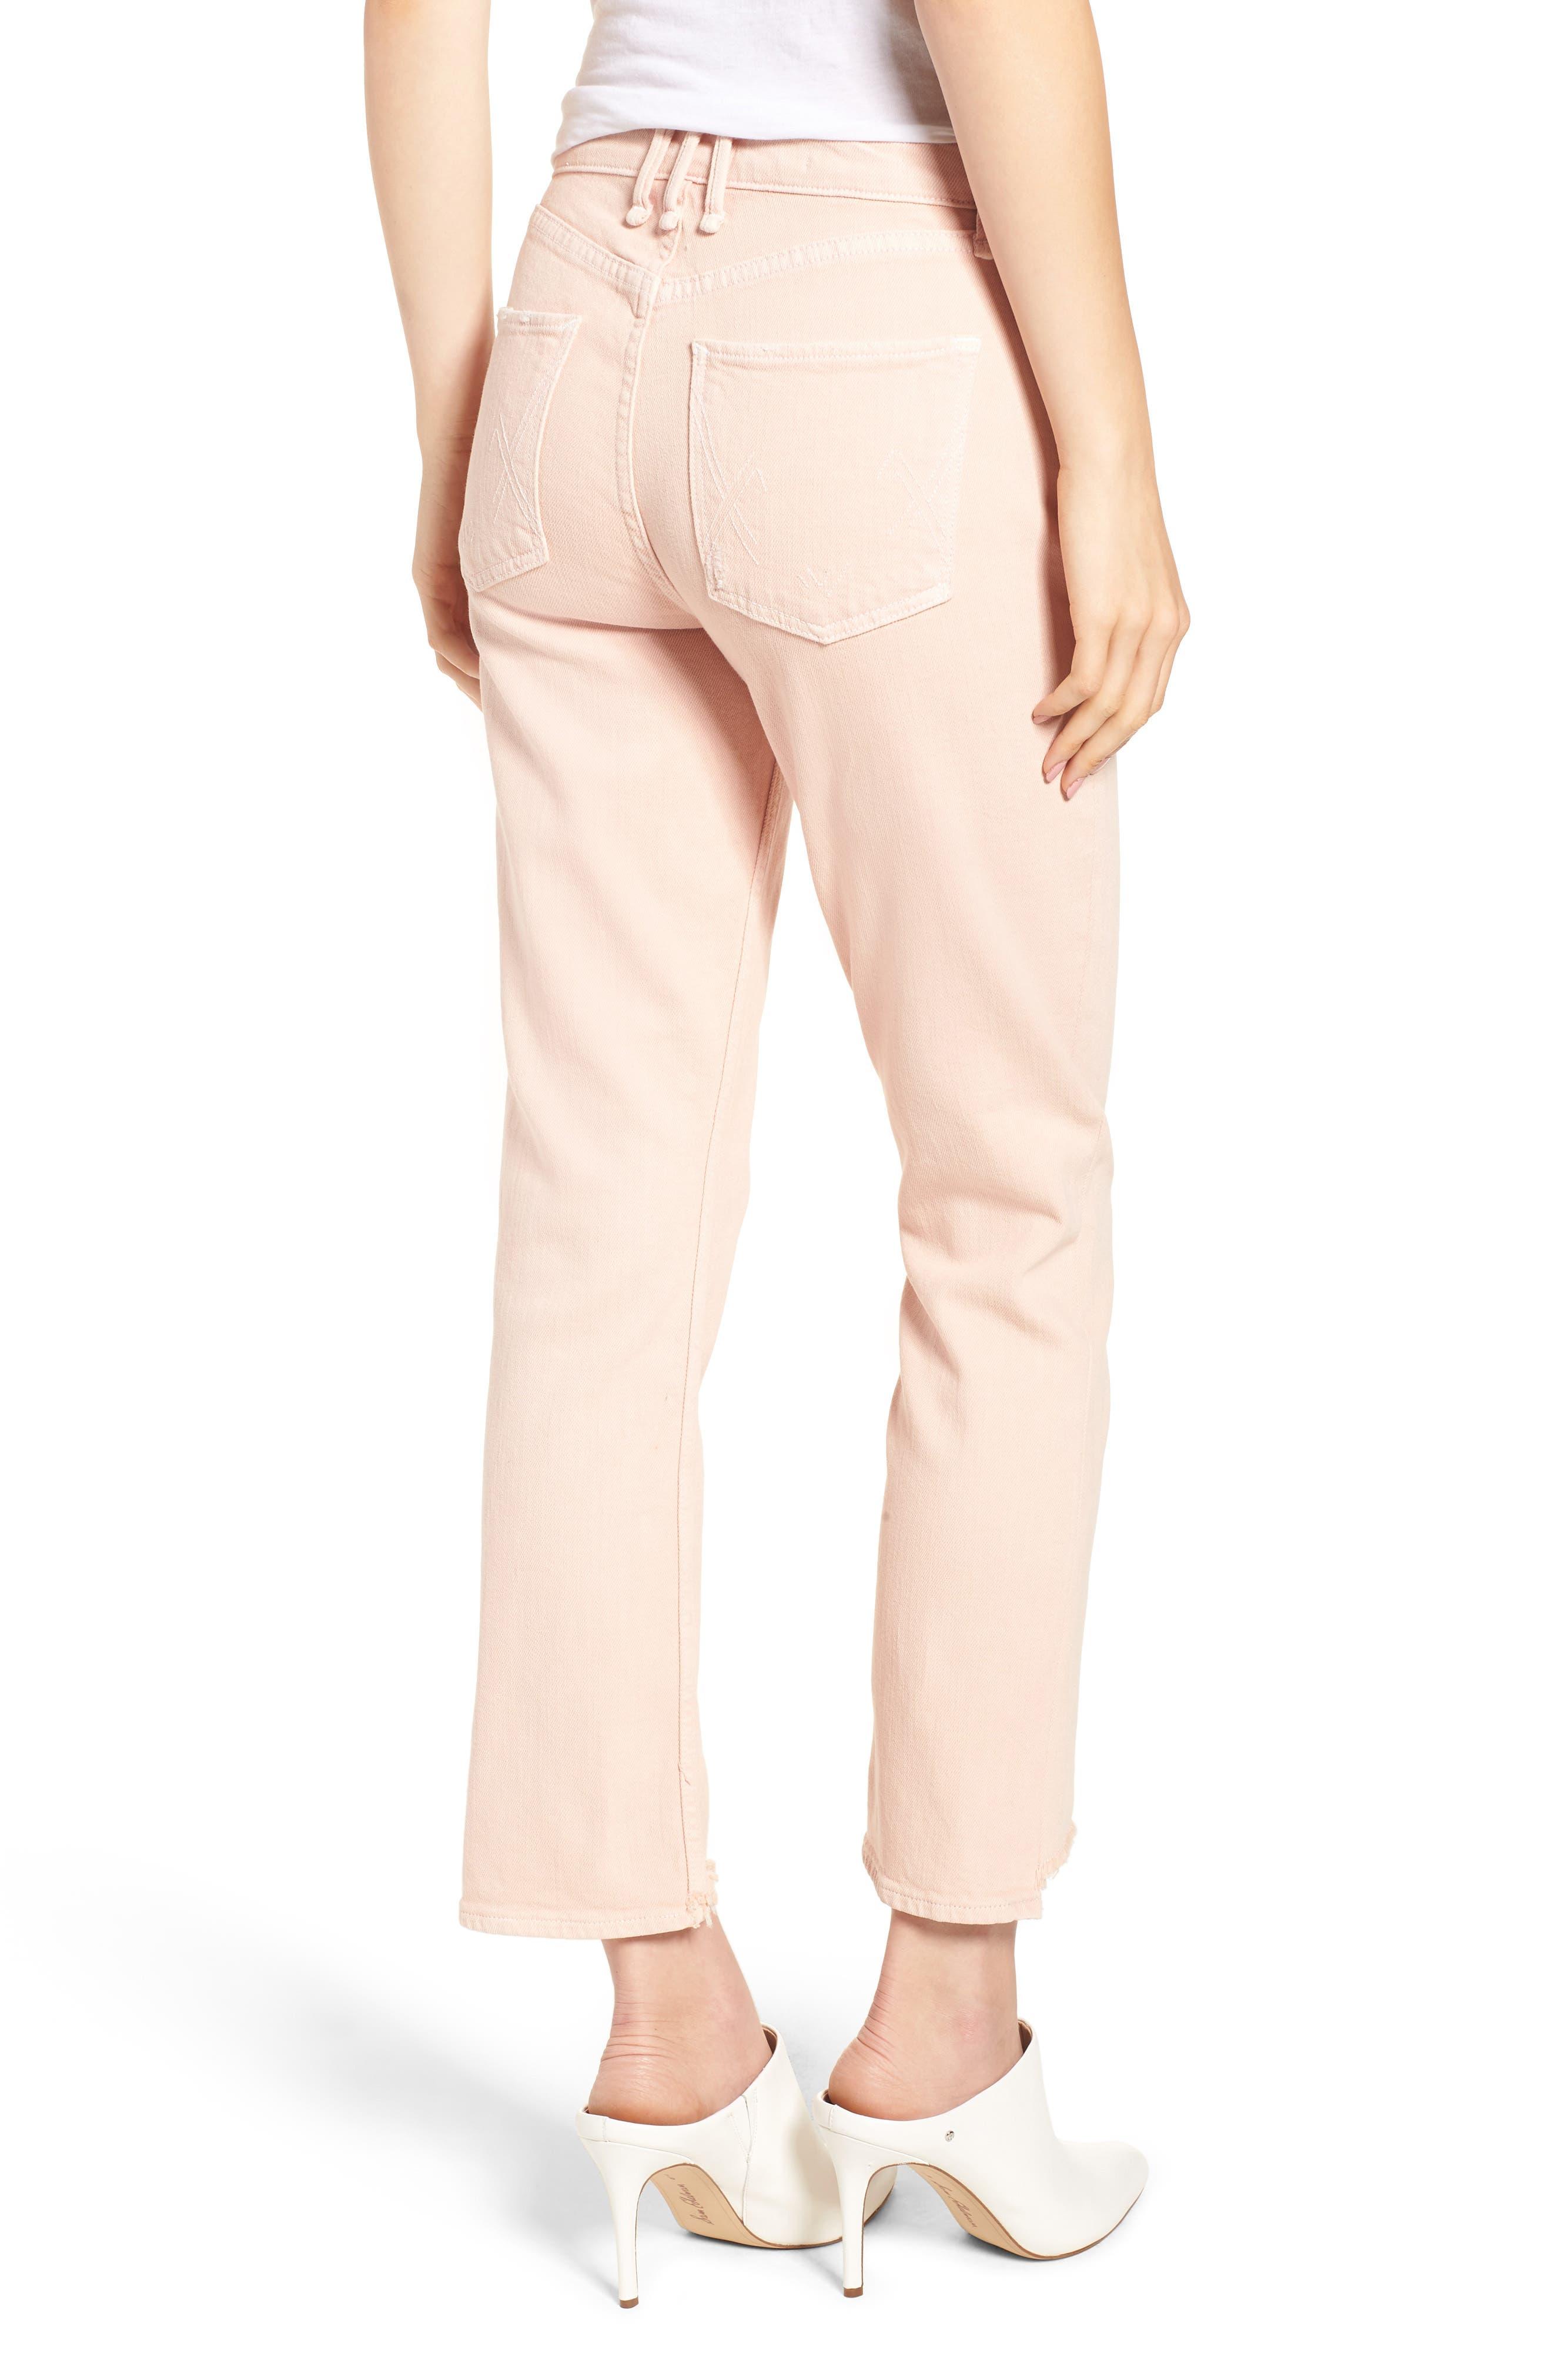 Valletta High Waist Crop Straight Leg Jeans,                             Alternate thumbnail 2, color,                             Punch Pink